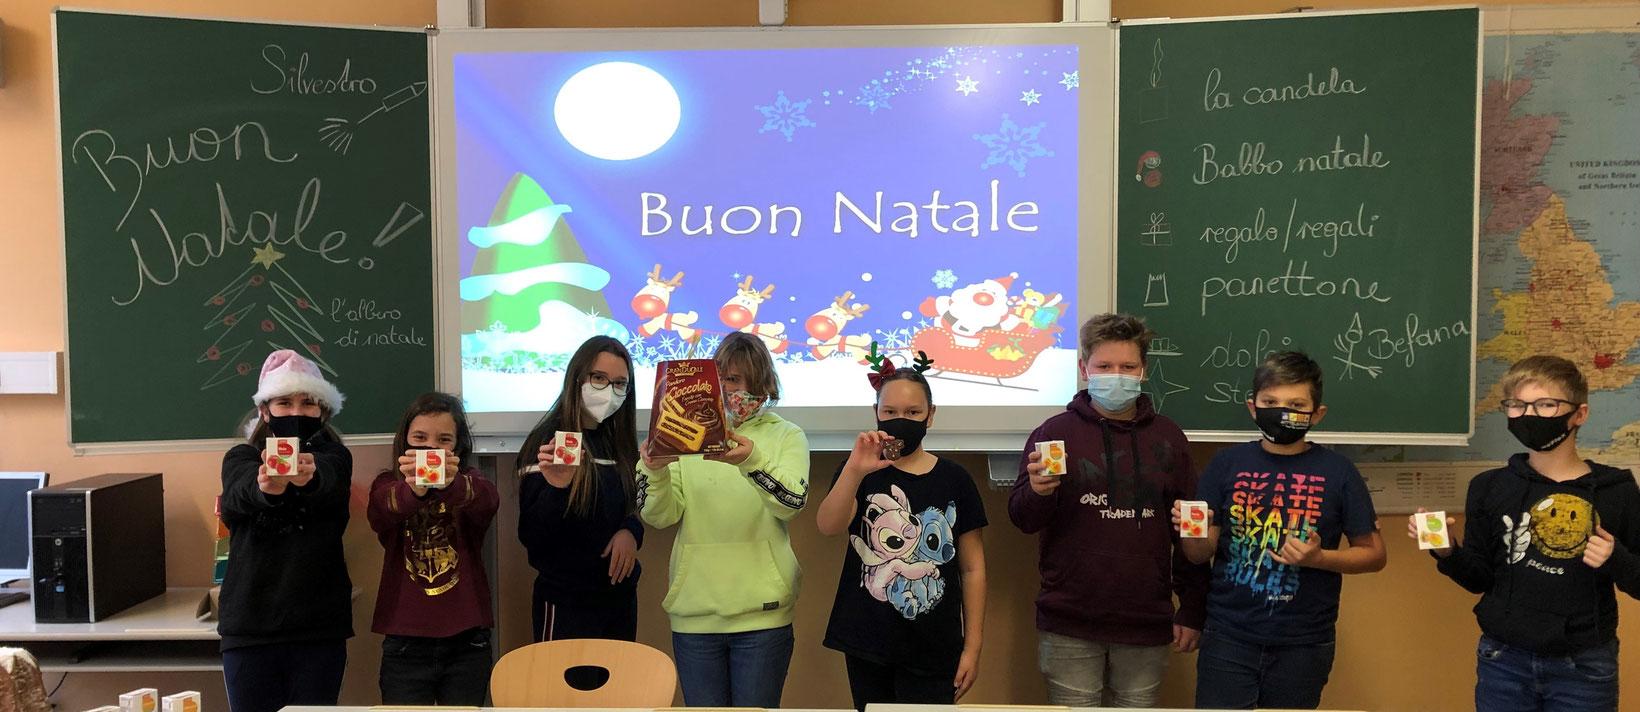 Italienisch dialog kennenlernen